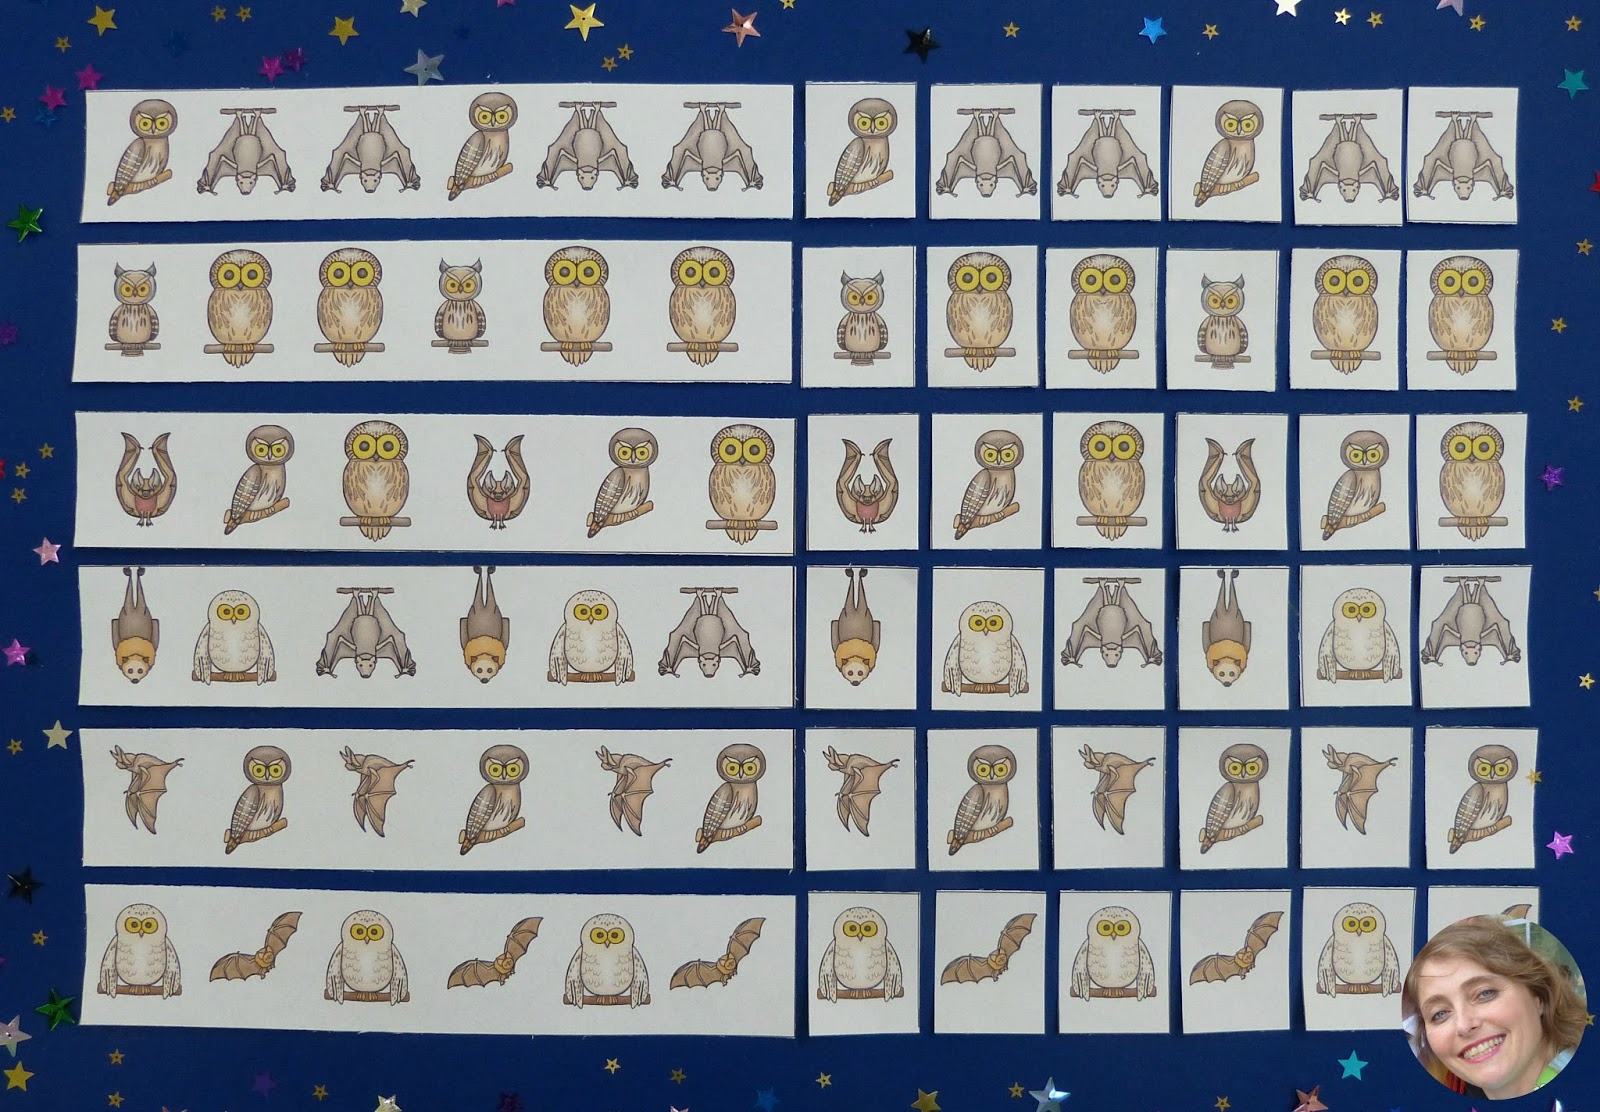 Paula S Primary Classroom Whoo Whoo Loves Owls